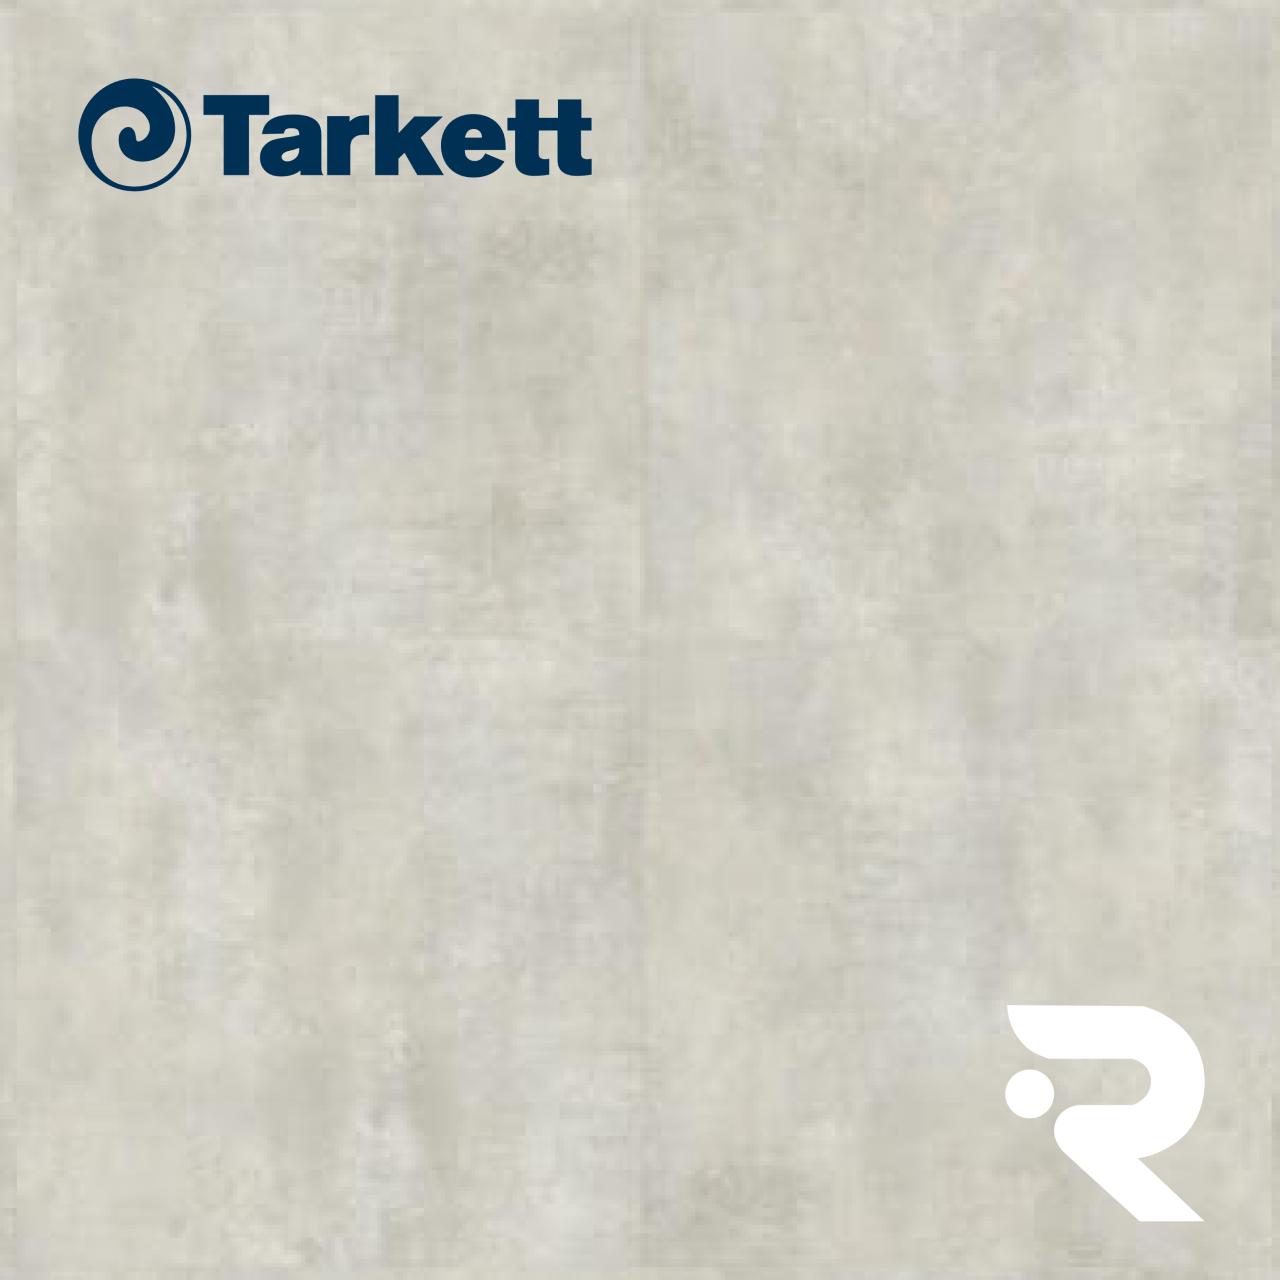 🌳 ПВХ плитка Tarkett | ModularT 7 - BETON COLD BEIGE | Art Vinyl | 600 x 600 мм